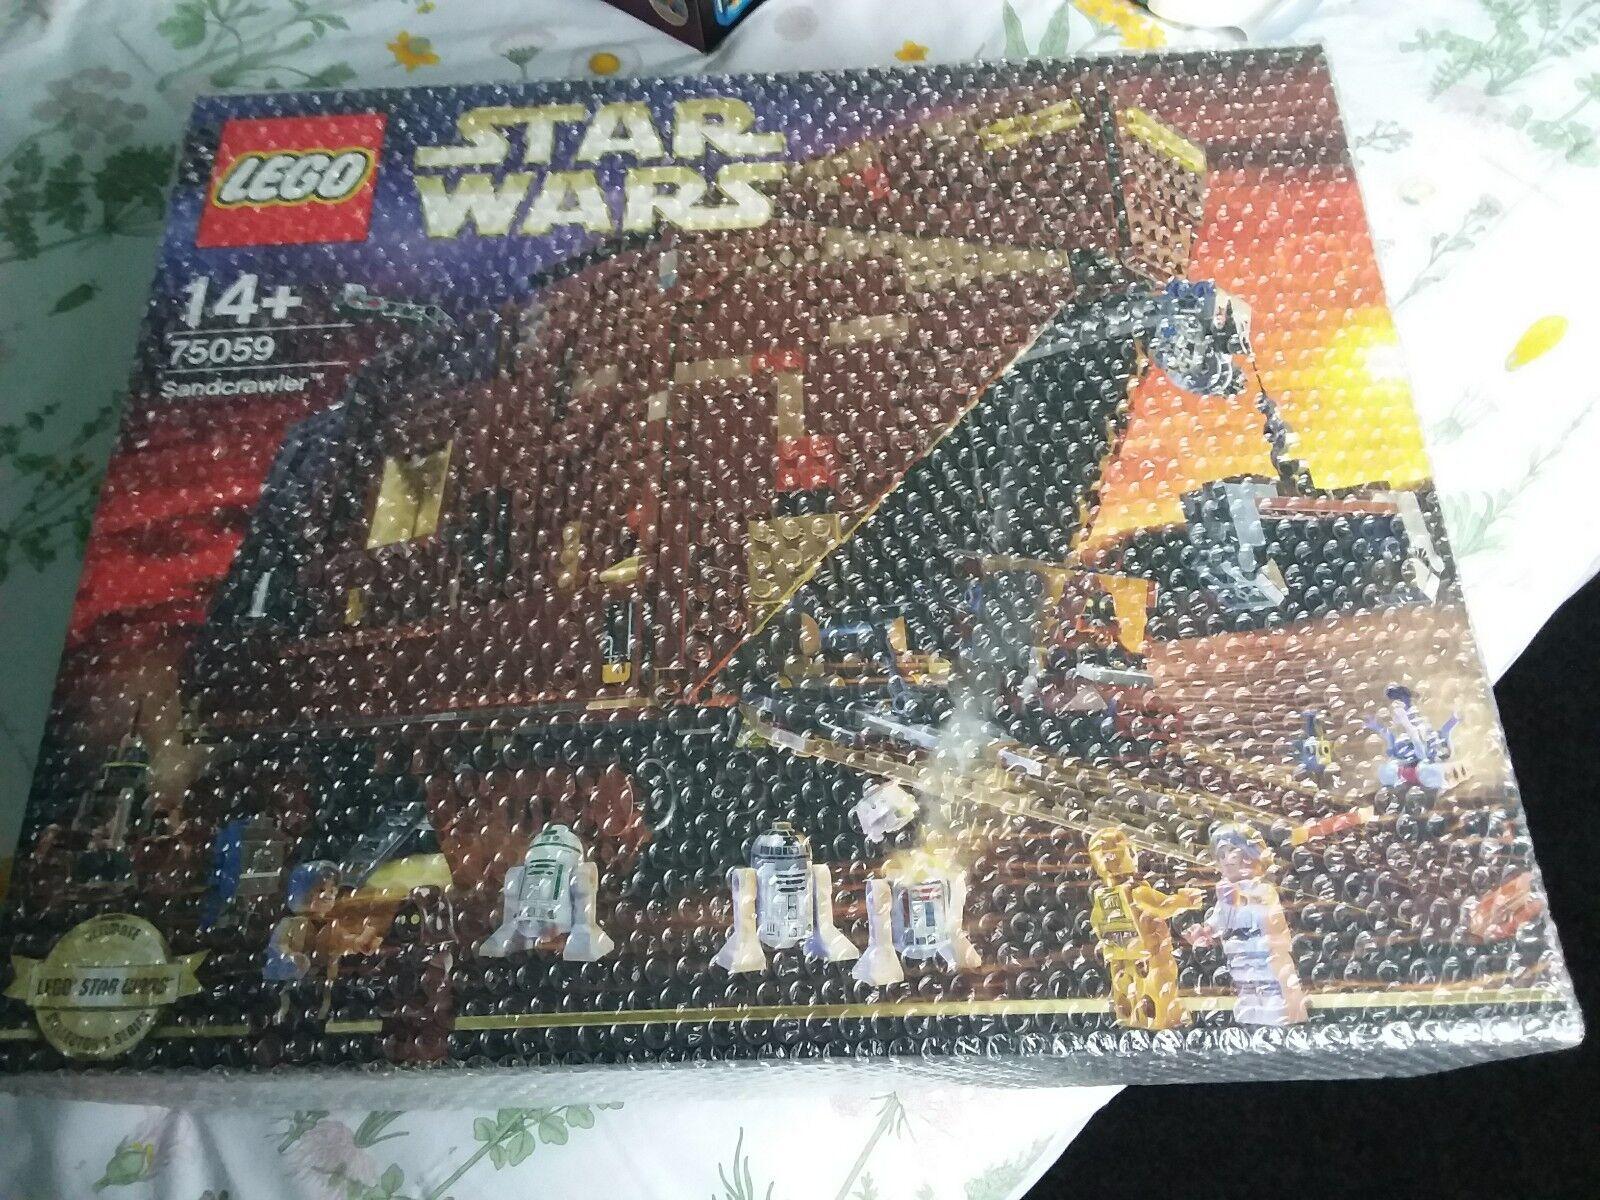 Lego Star Wars UCS Sandcrawler 75059 75059 75059 brand new in factory sealed box - RetiROT 80254f